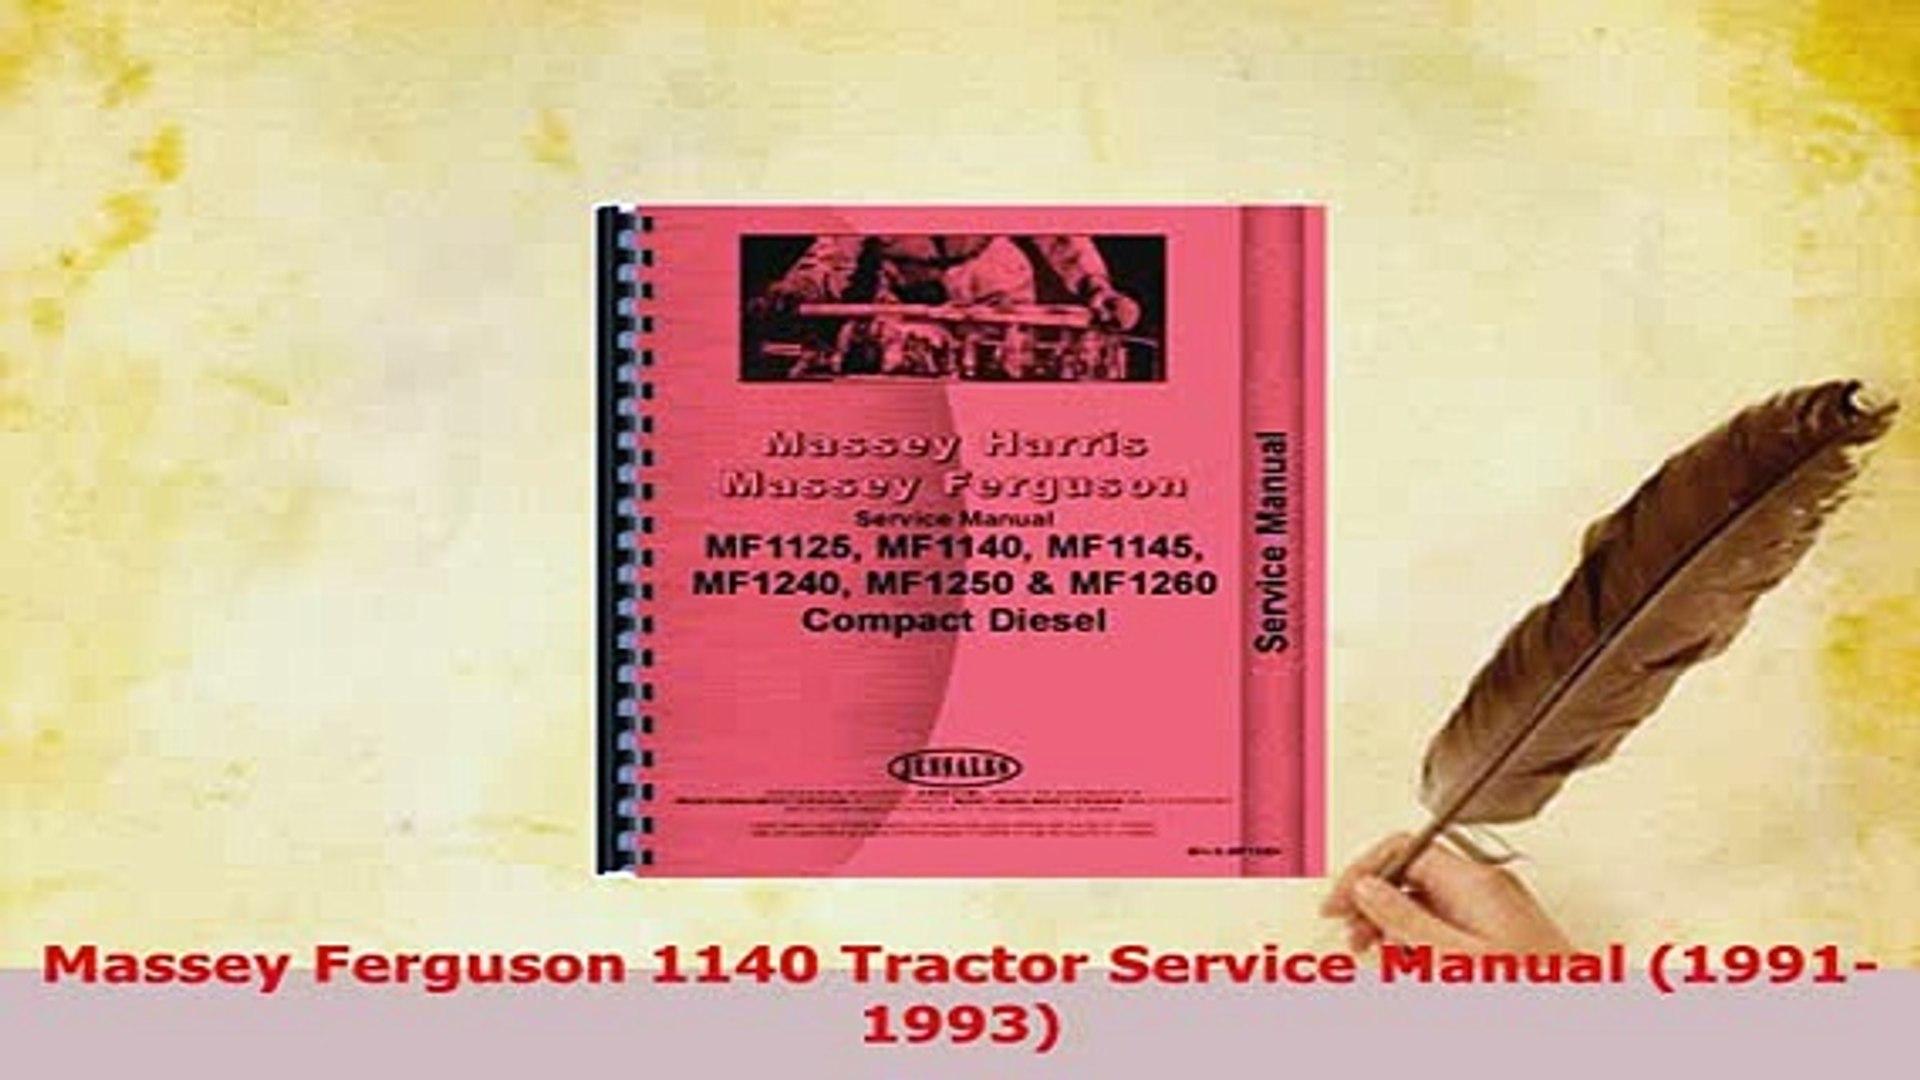 PDF Massey Ferguson 1140 Tractor Service Manual 19911993 PDF Book Free